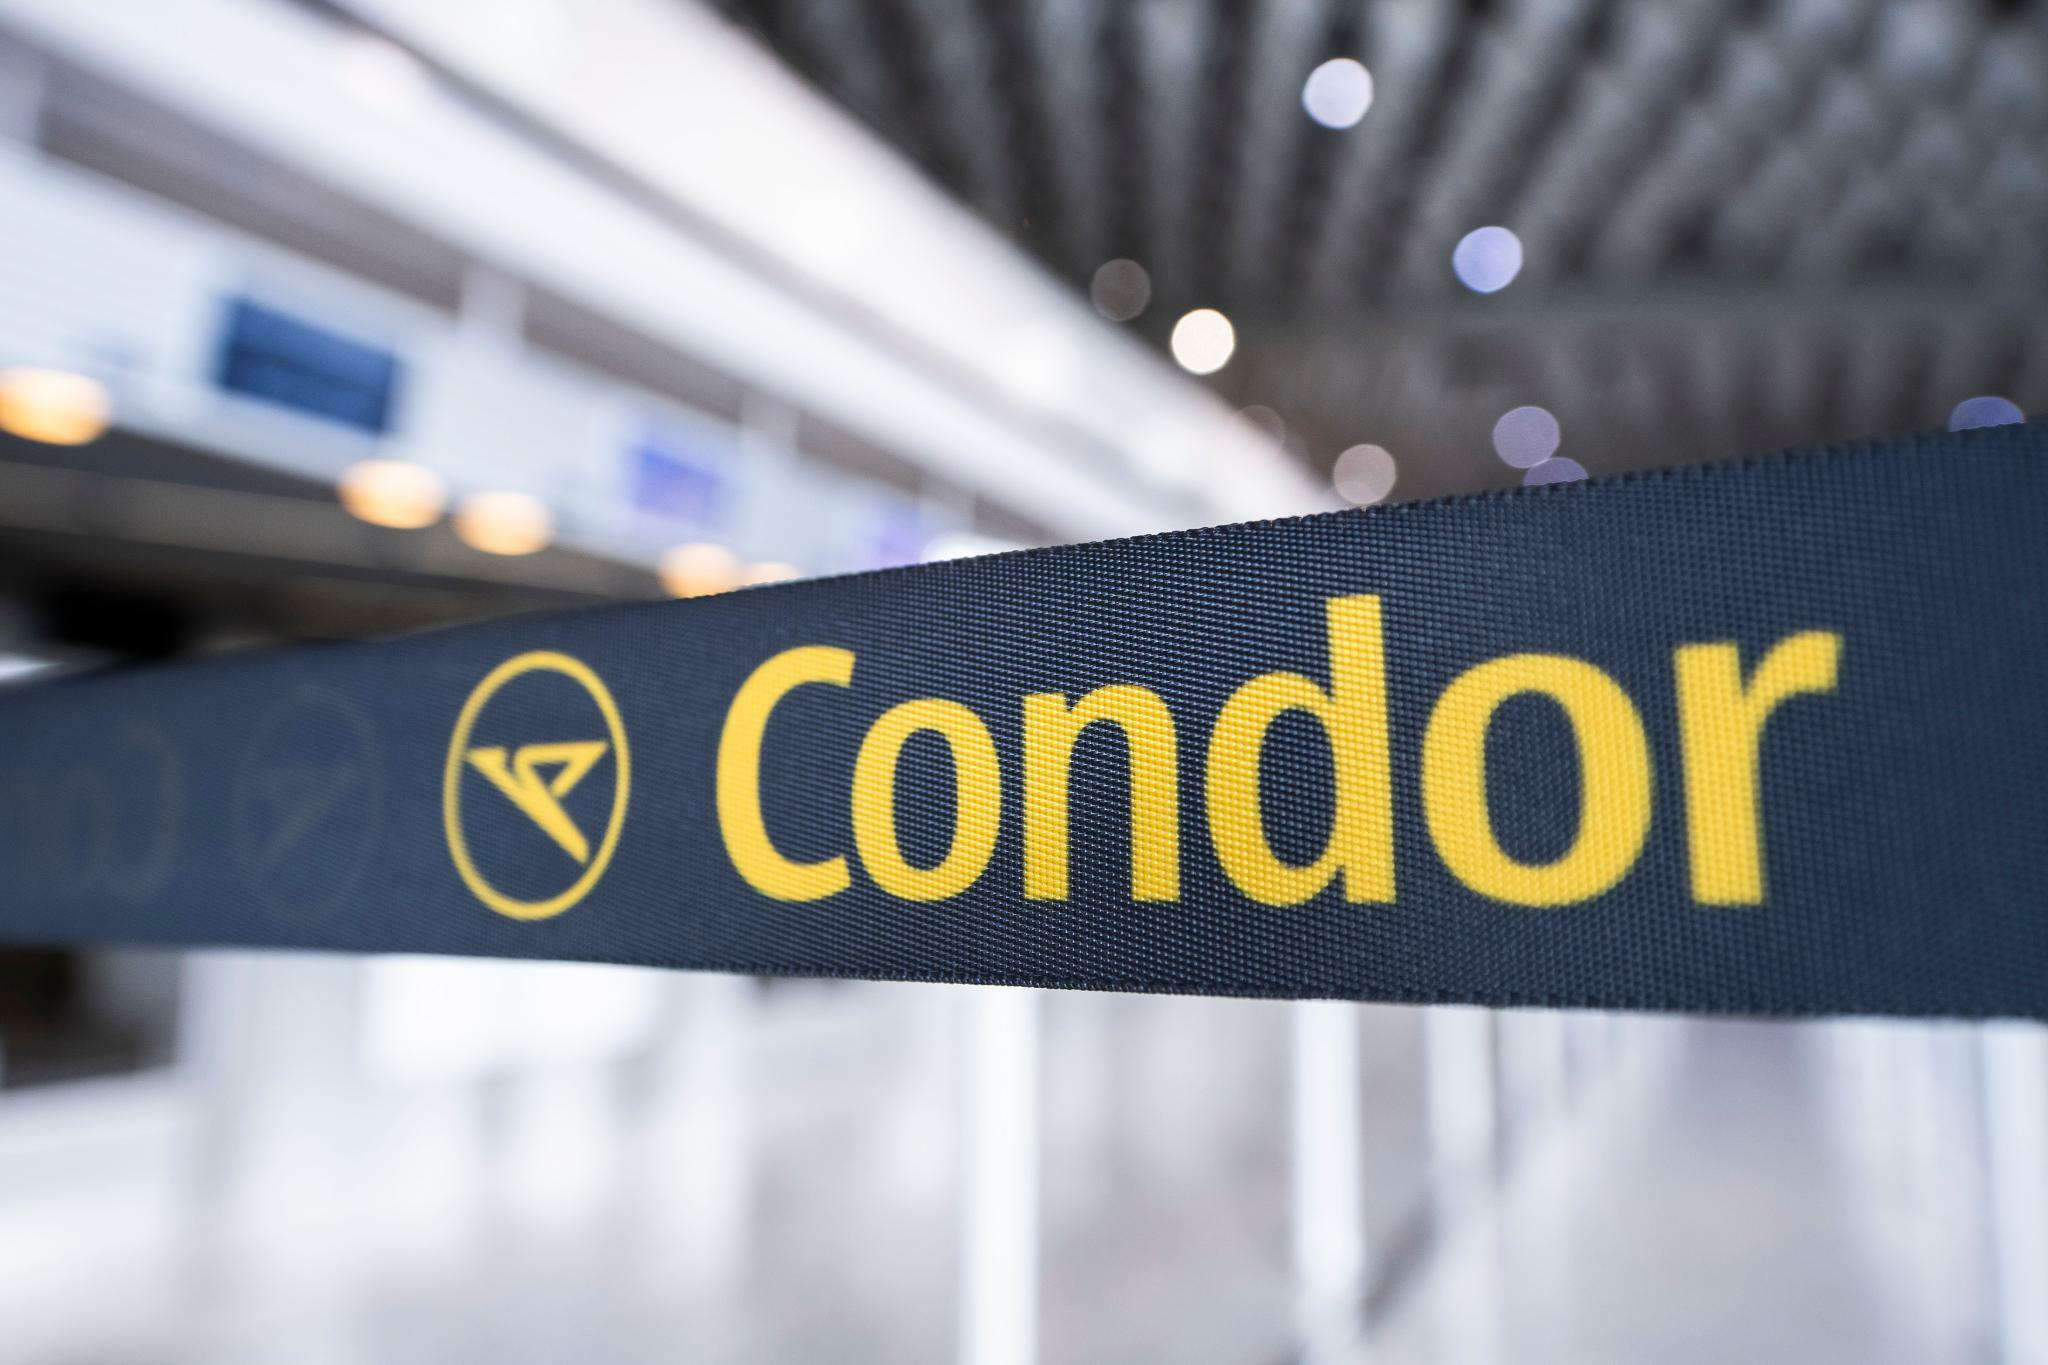 EU-Kommission genehmigt Überbrückungskredit für Condor